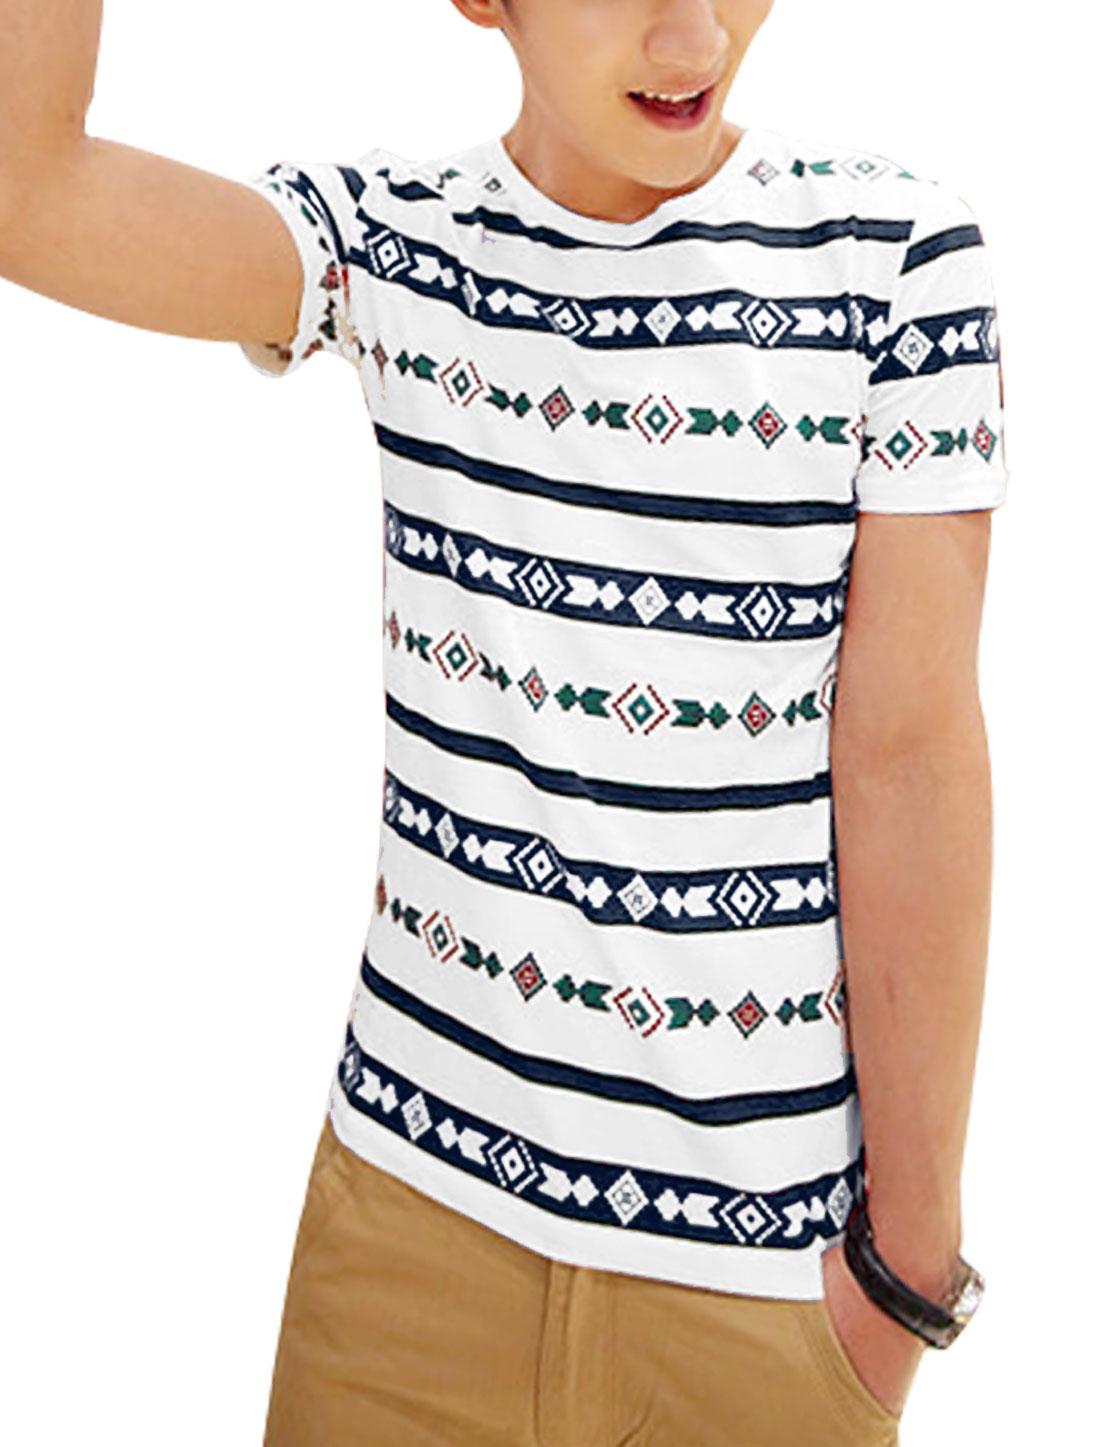 Men Pullover Round Neck Bar Striped T-Shirt White Navy Blue S